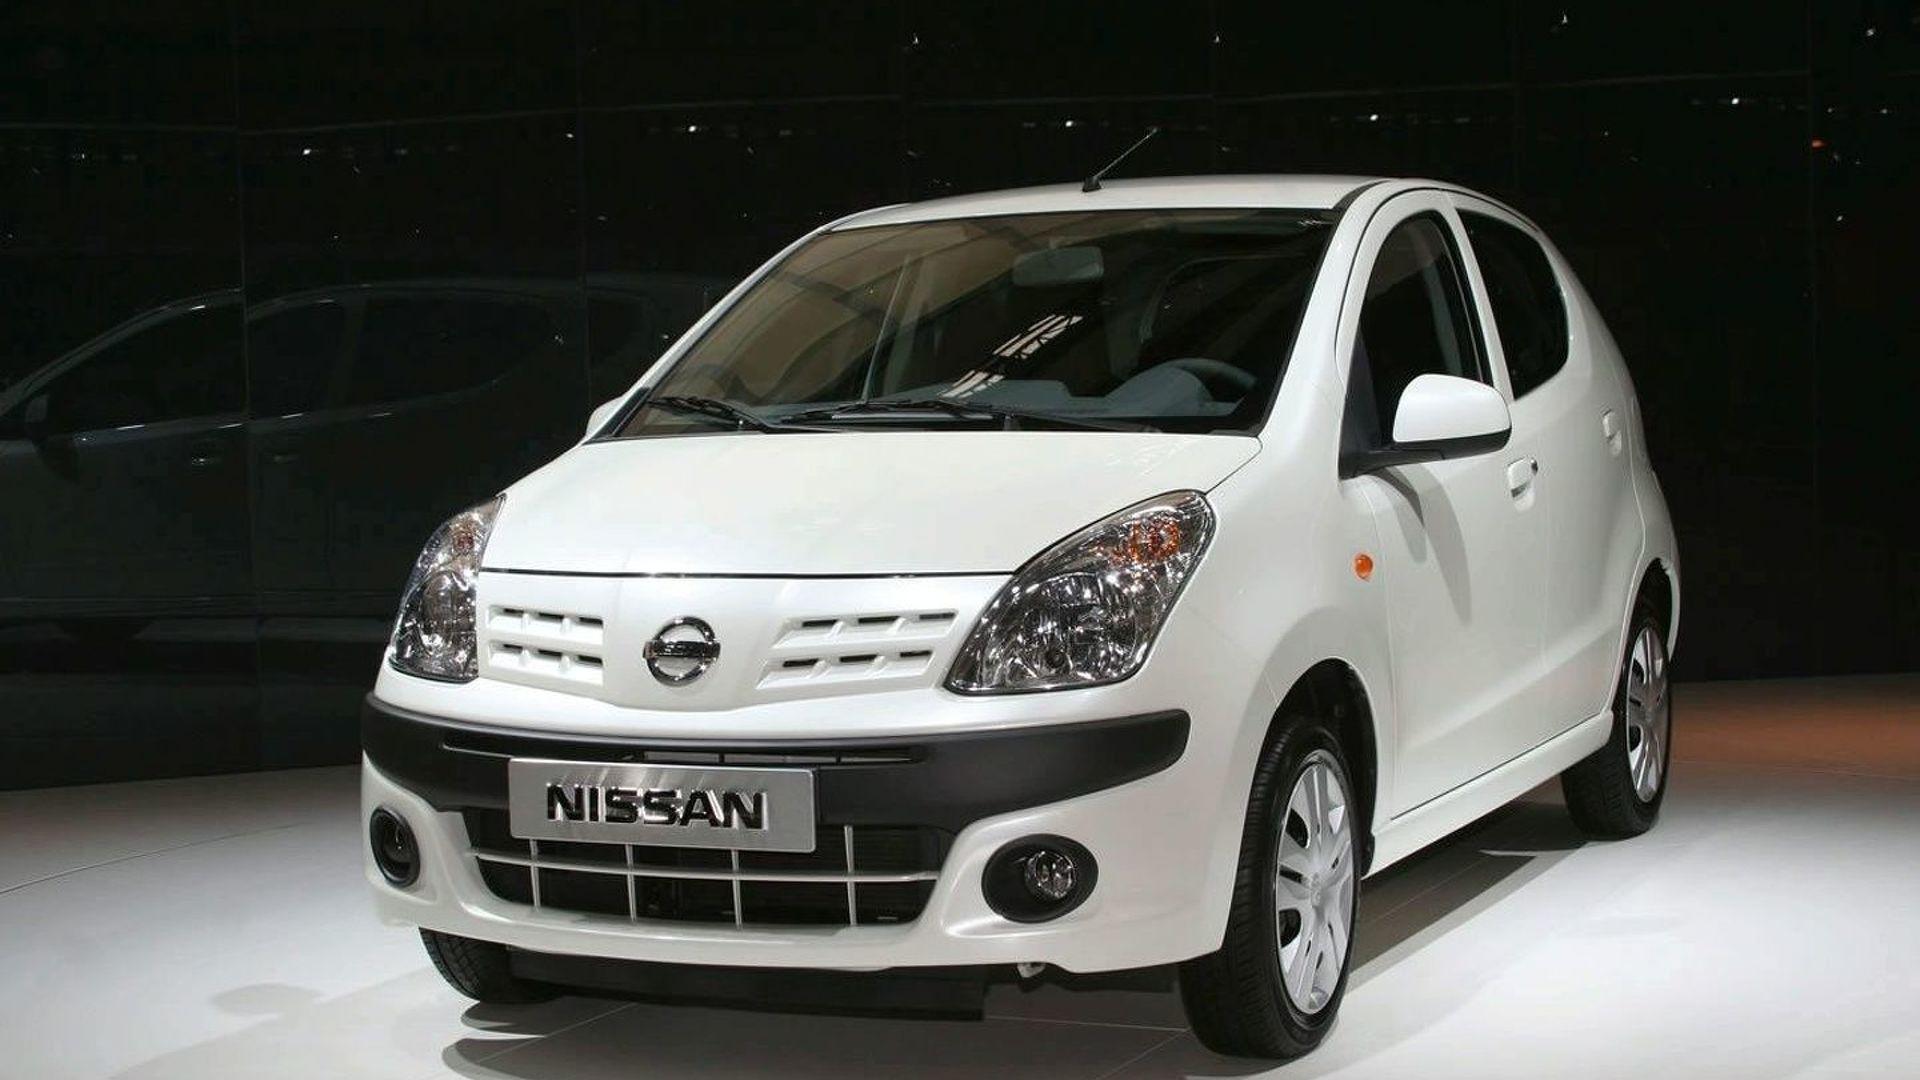 Nissan officially kills the Pixo